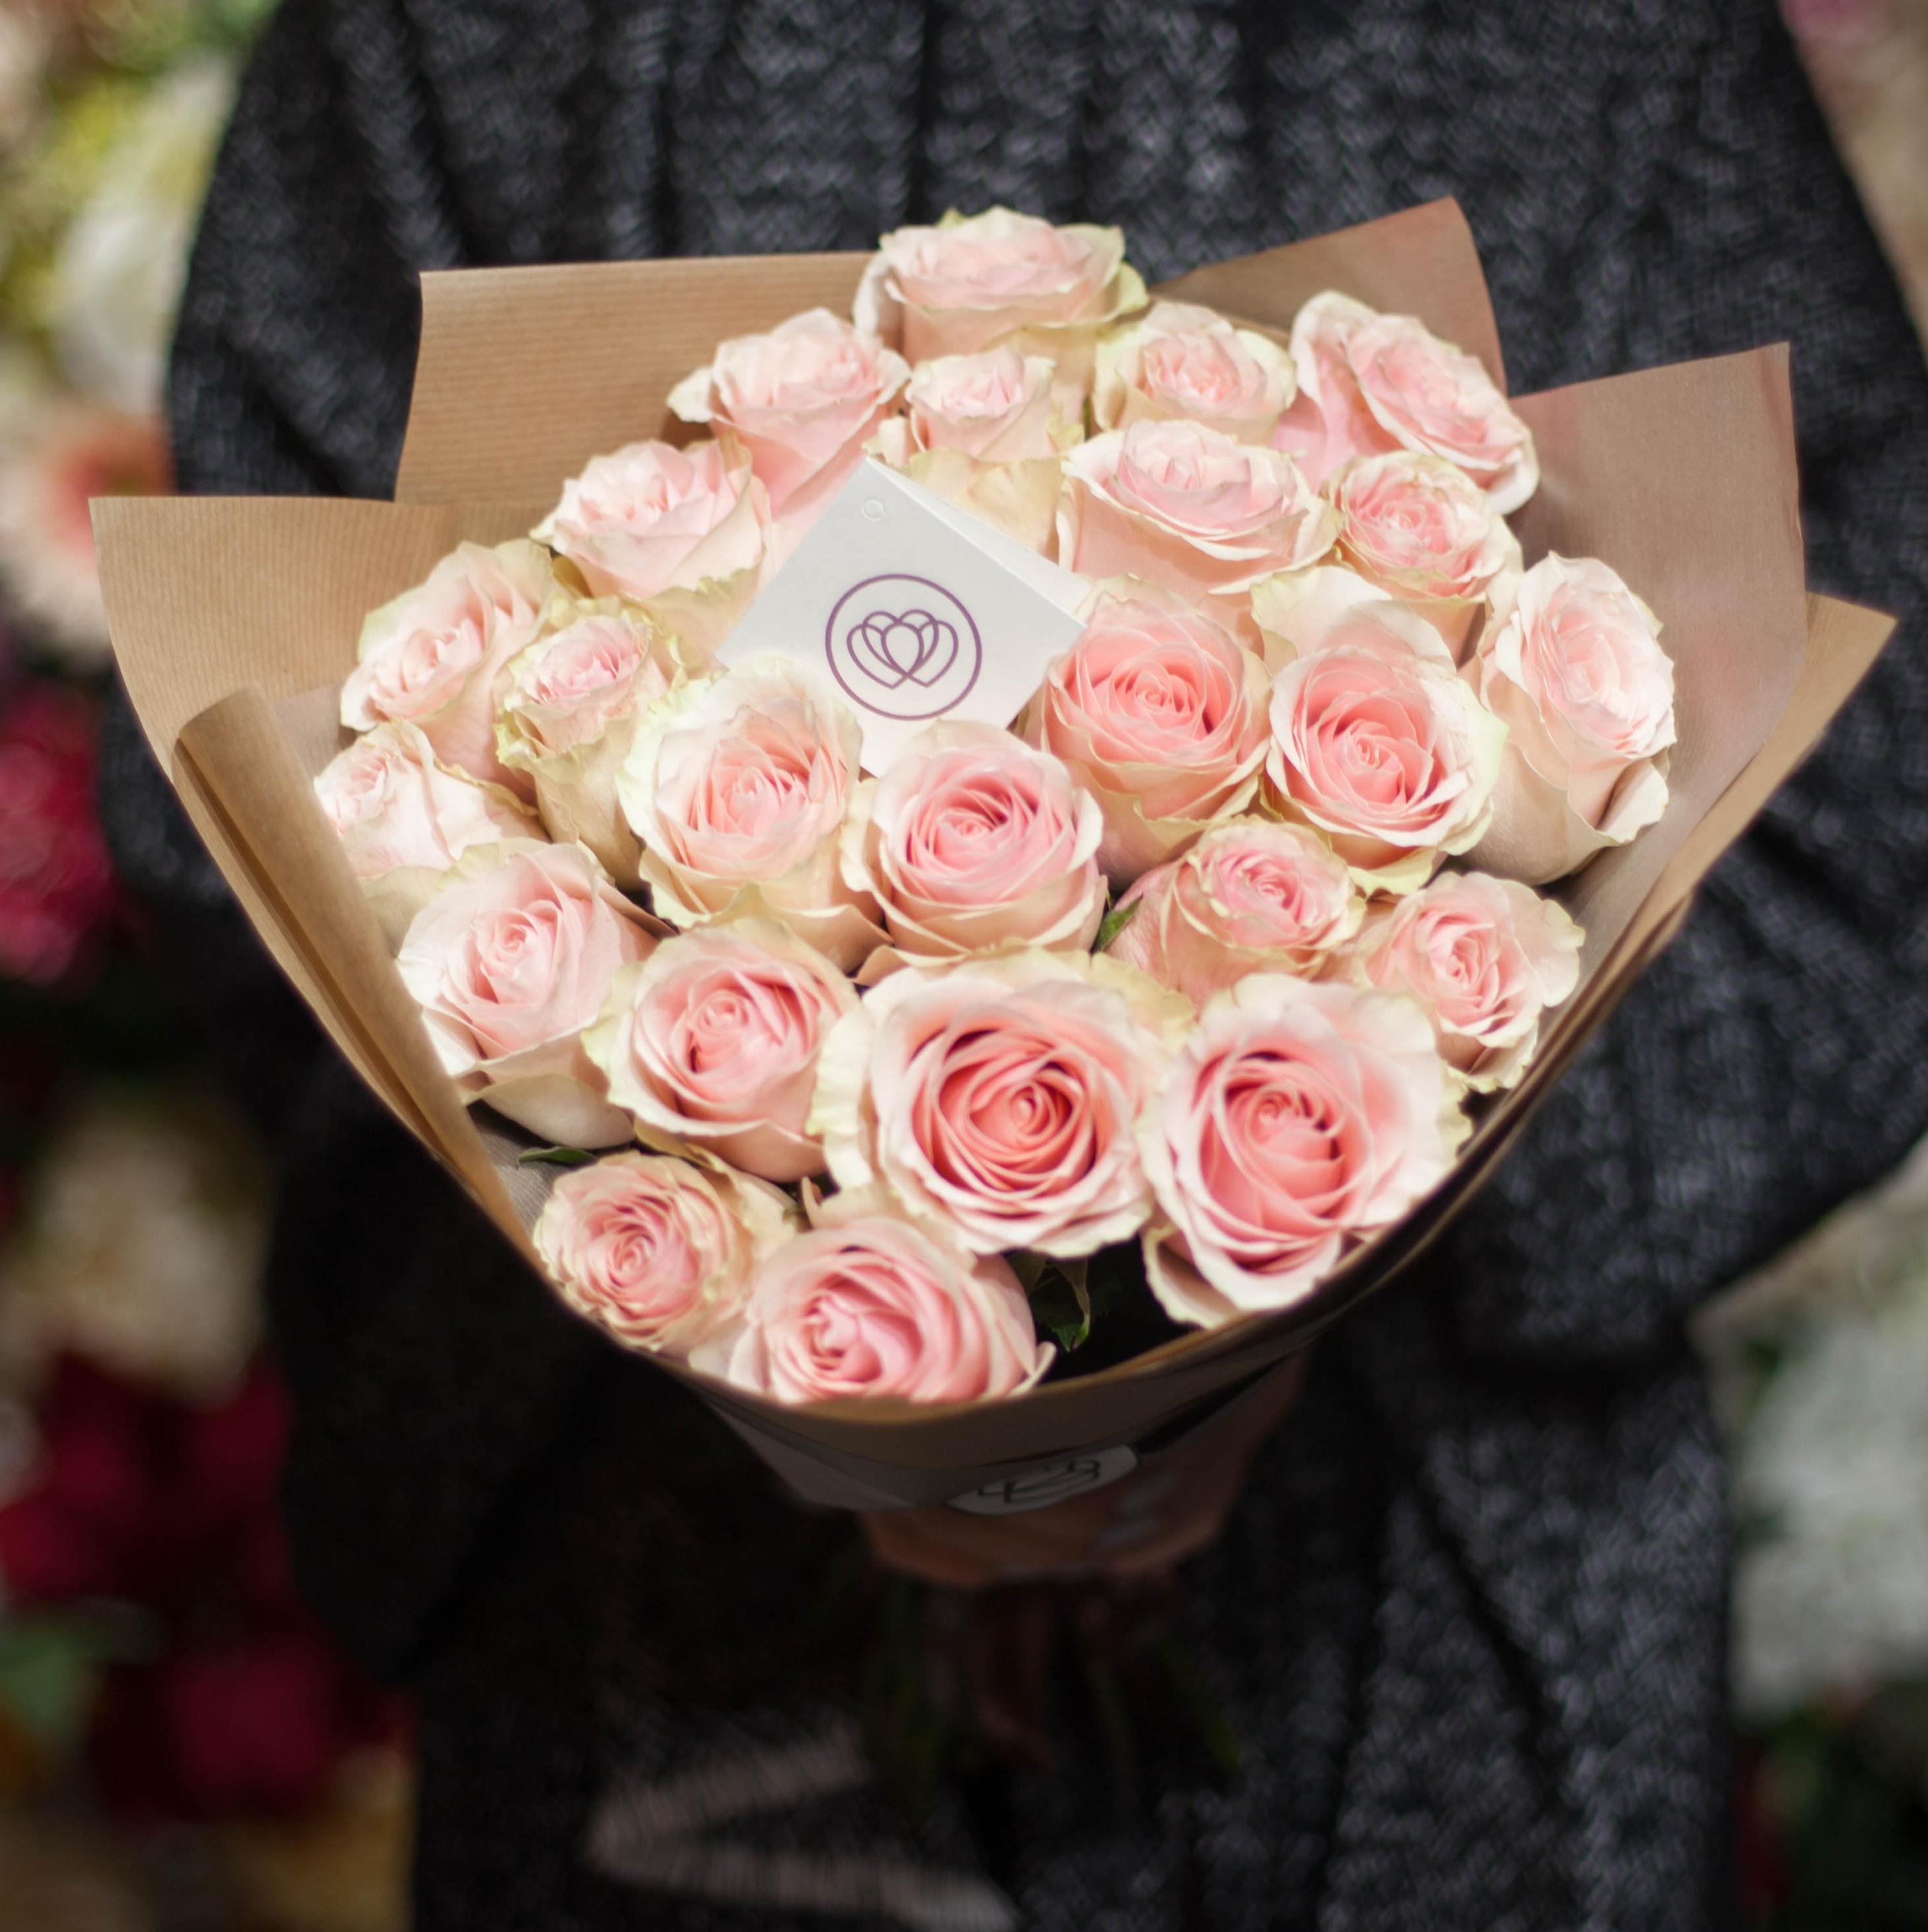 25 нежно-розовых роз Pink Mondial 50 см фото